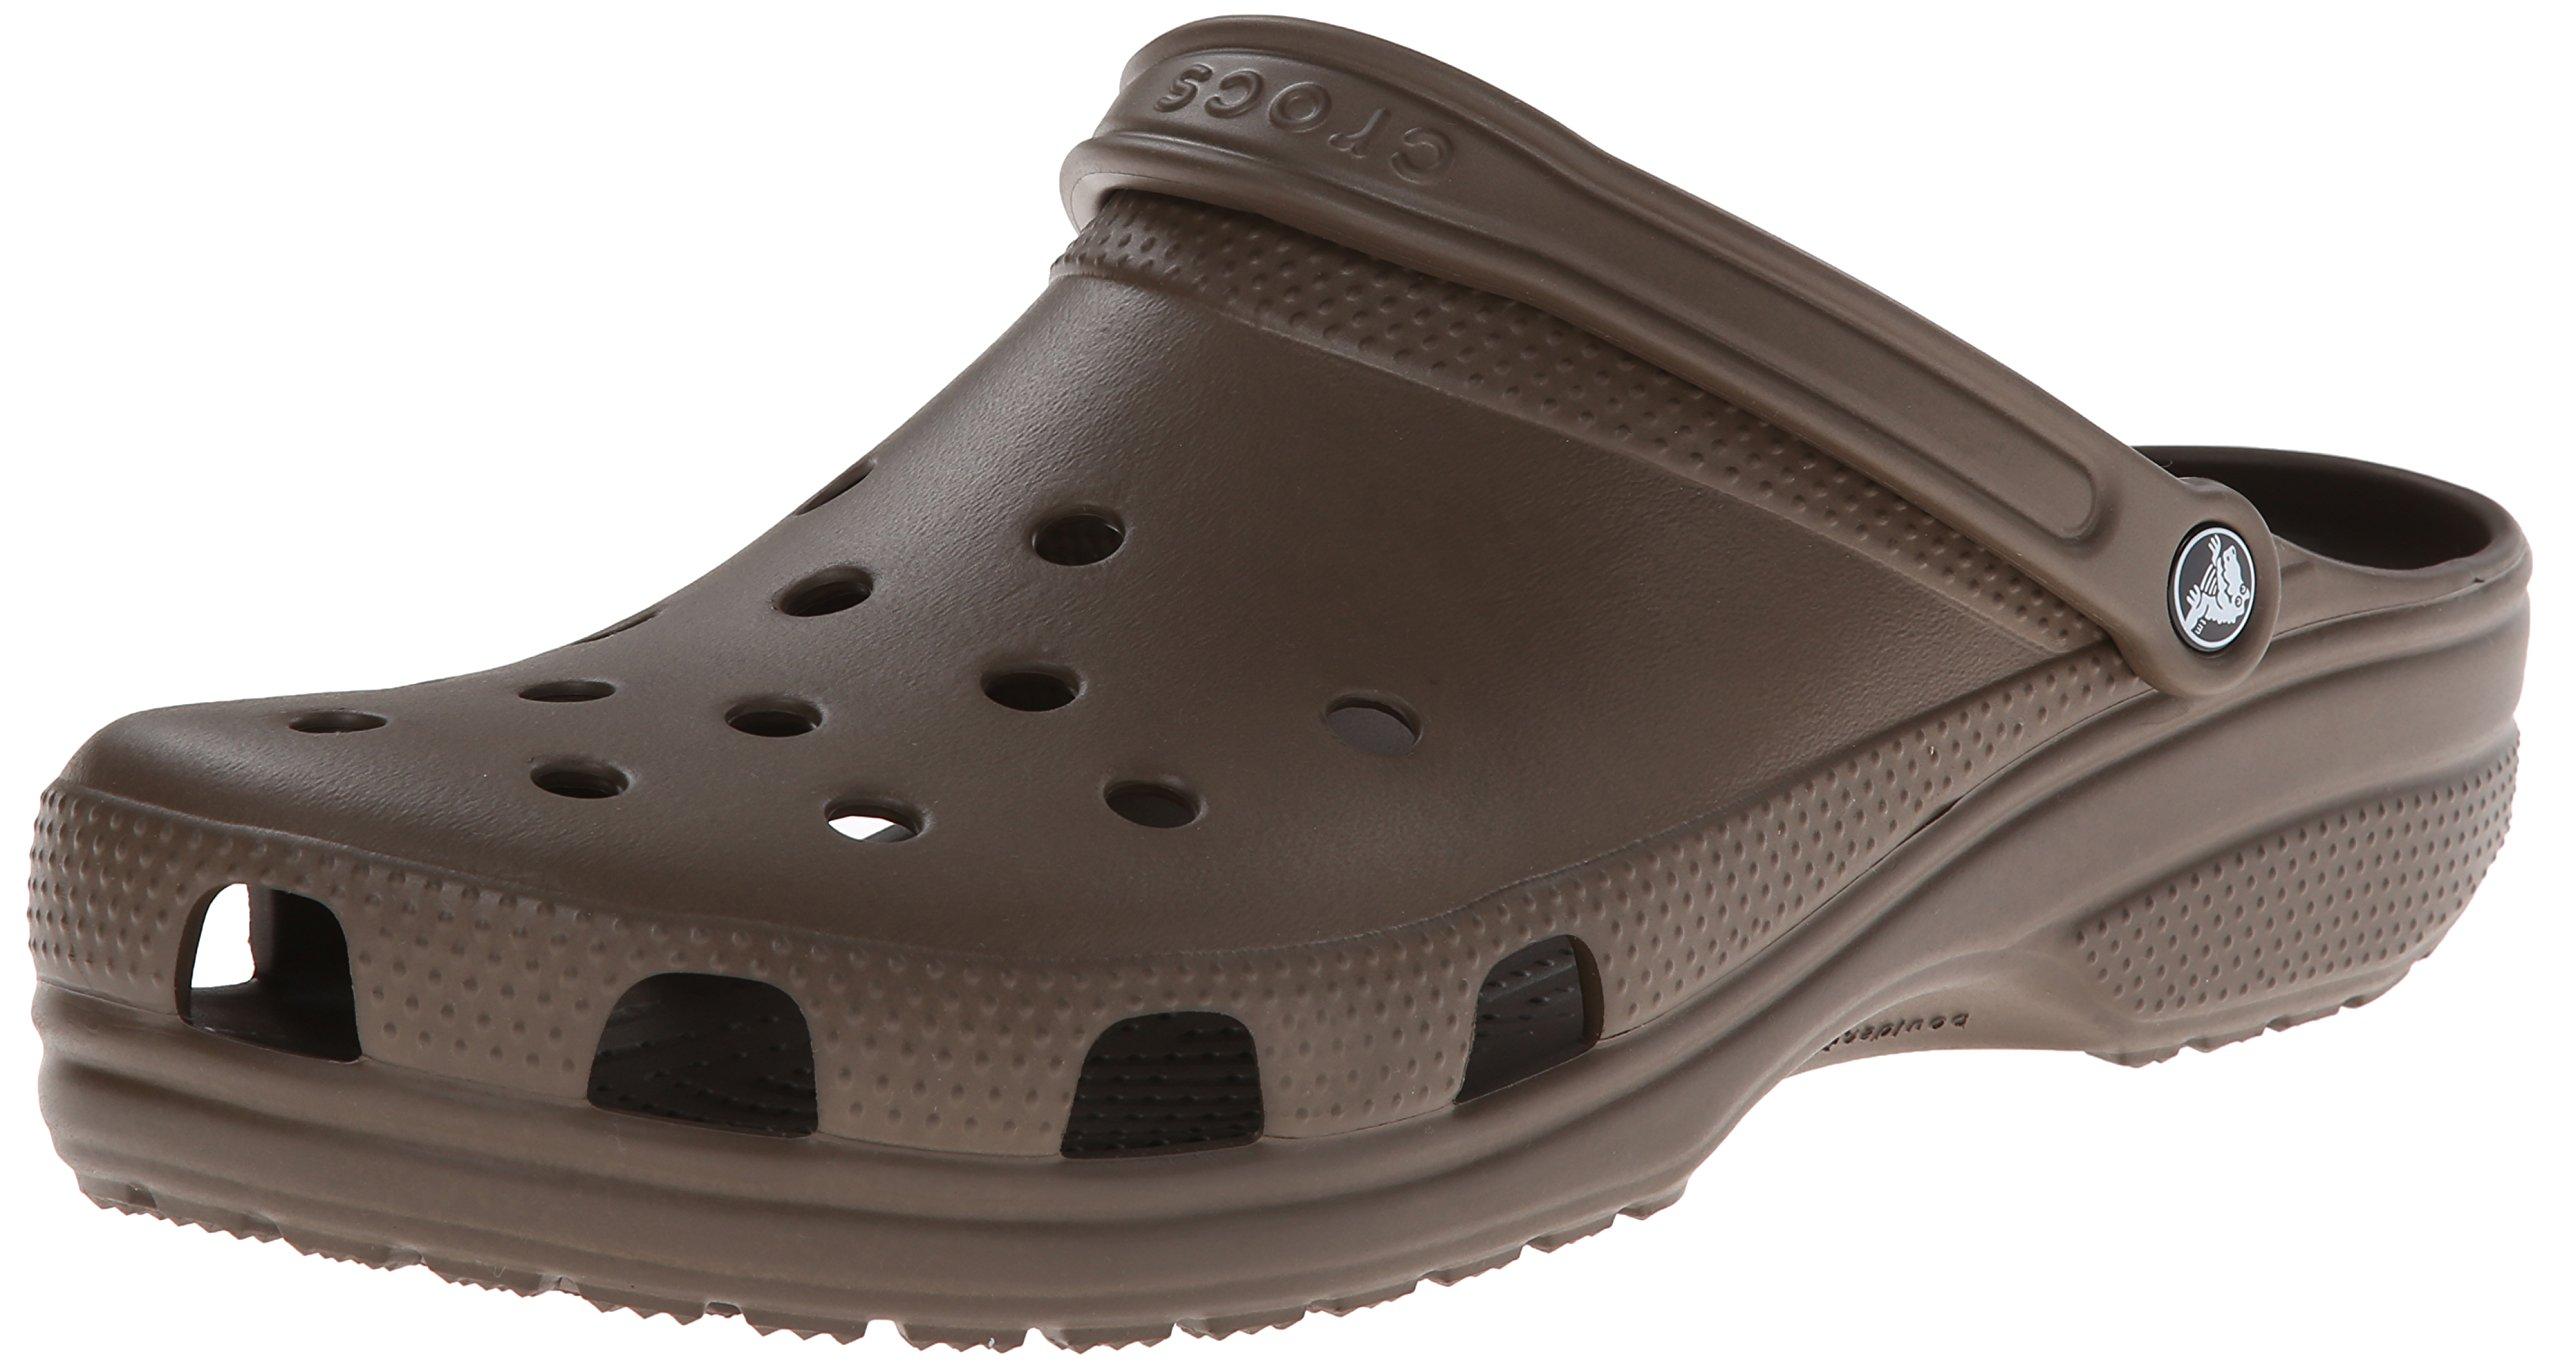 Crocs Women's Classic Clog|Comfortable Slip On Casual Water Shoe, Chocolate, 11 M US Women / 9 M US Men by Crocs